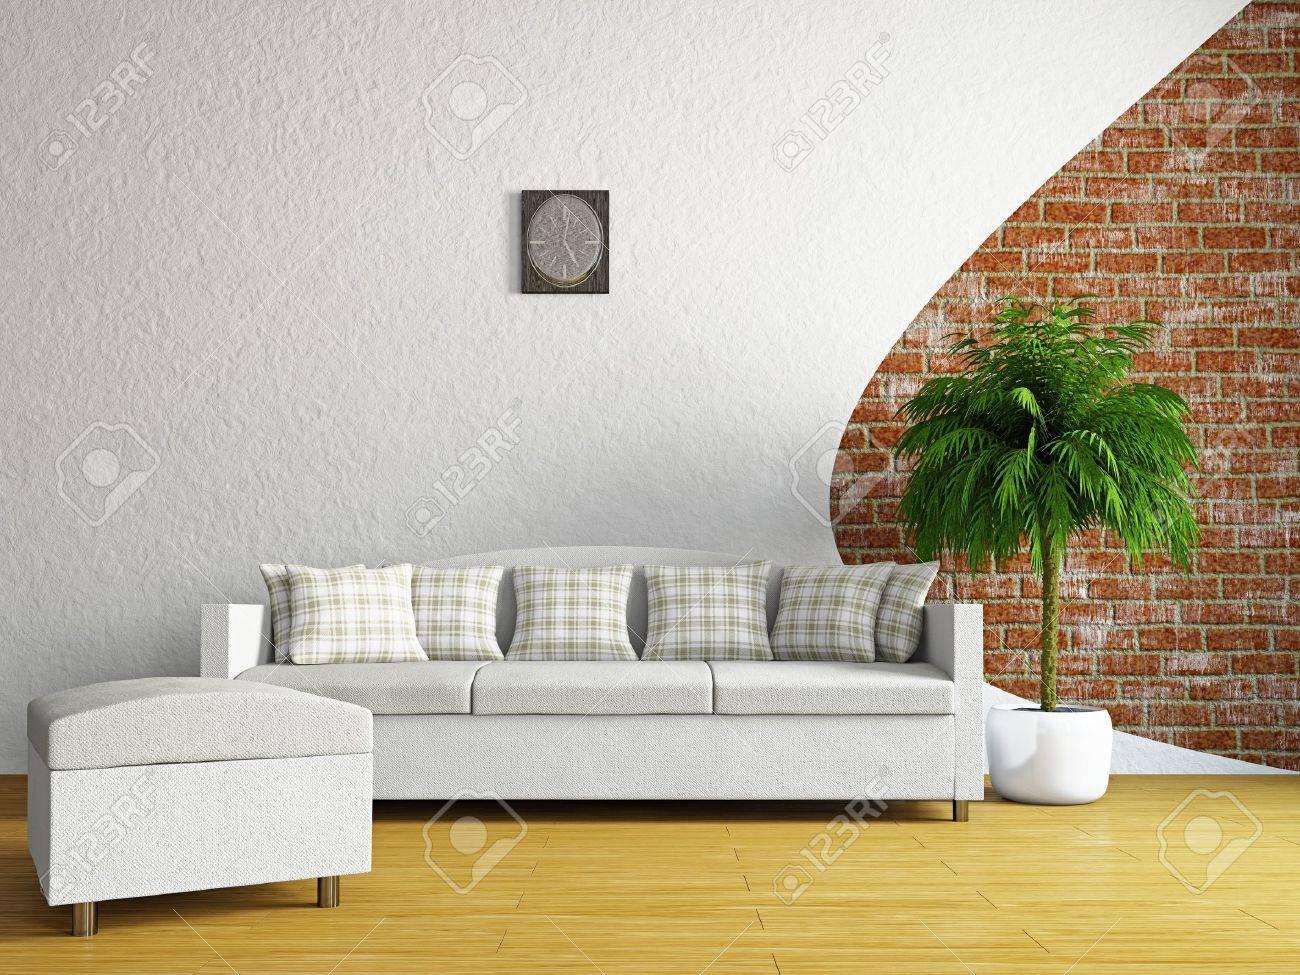 Livingroom with sofa near the wall Stock Photo - 19160911